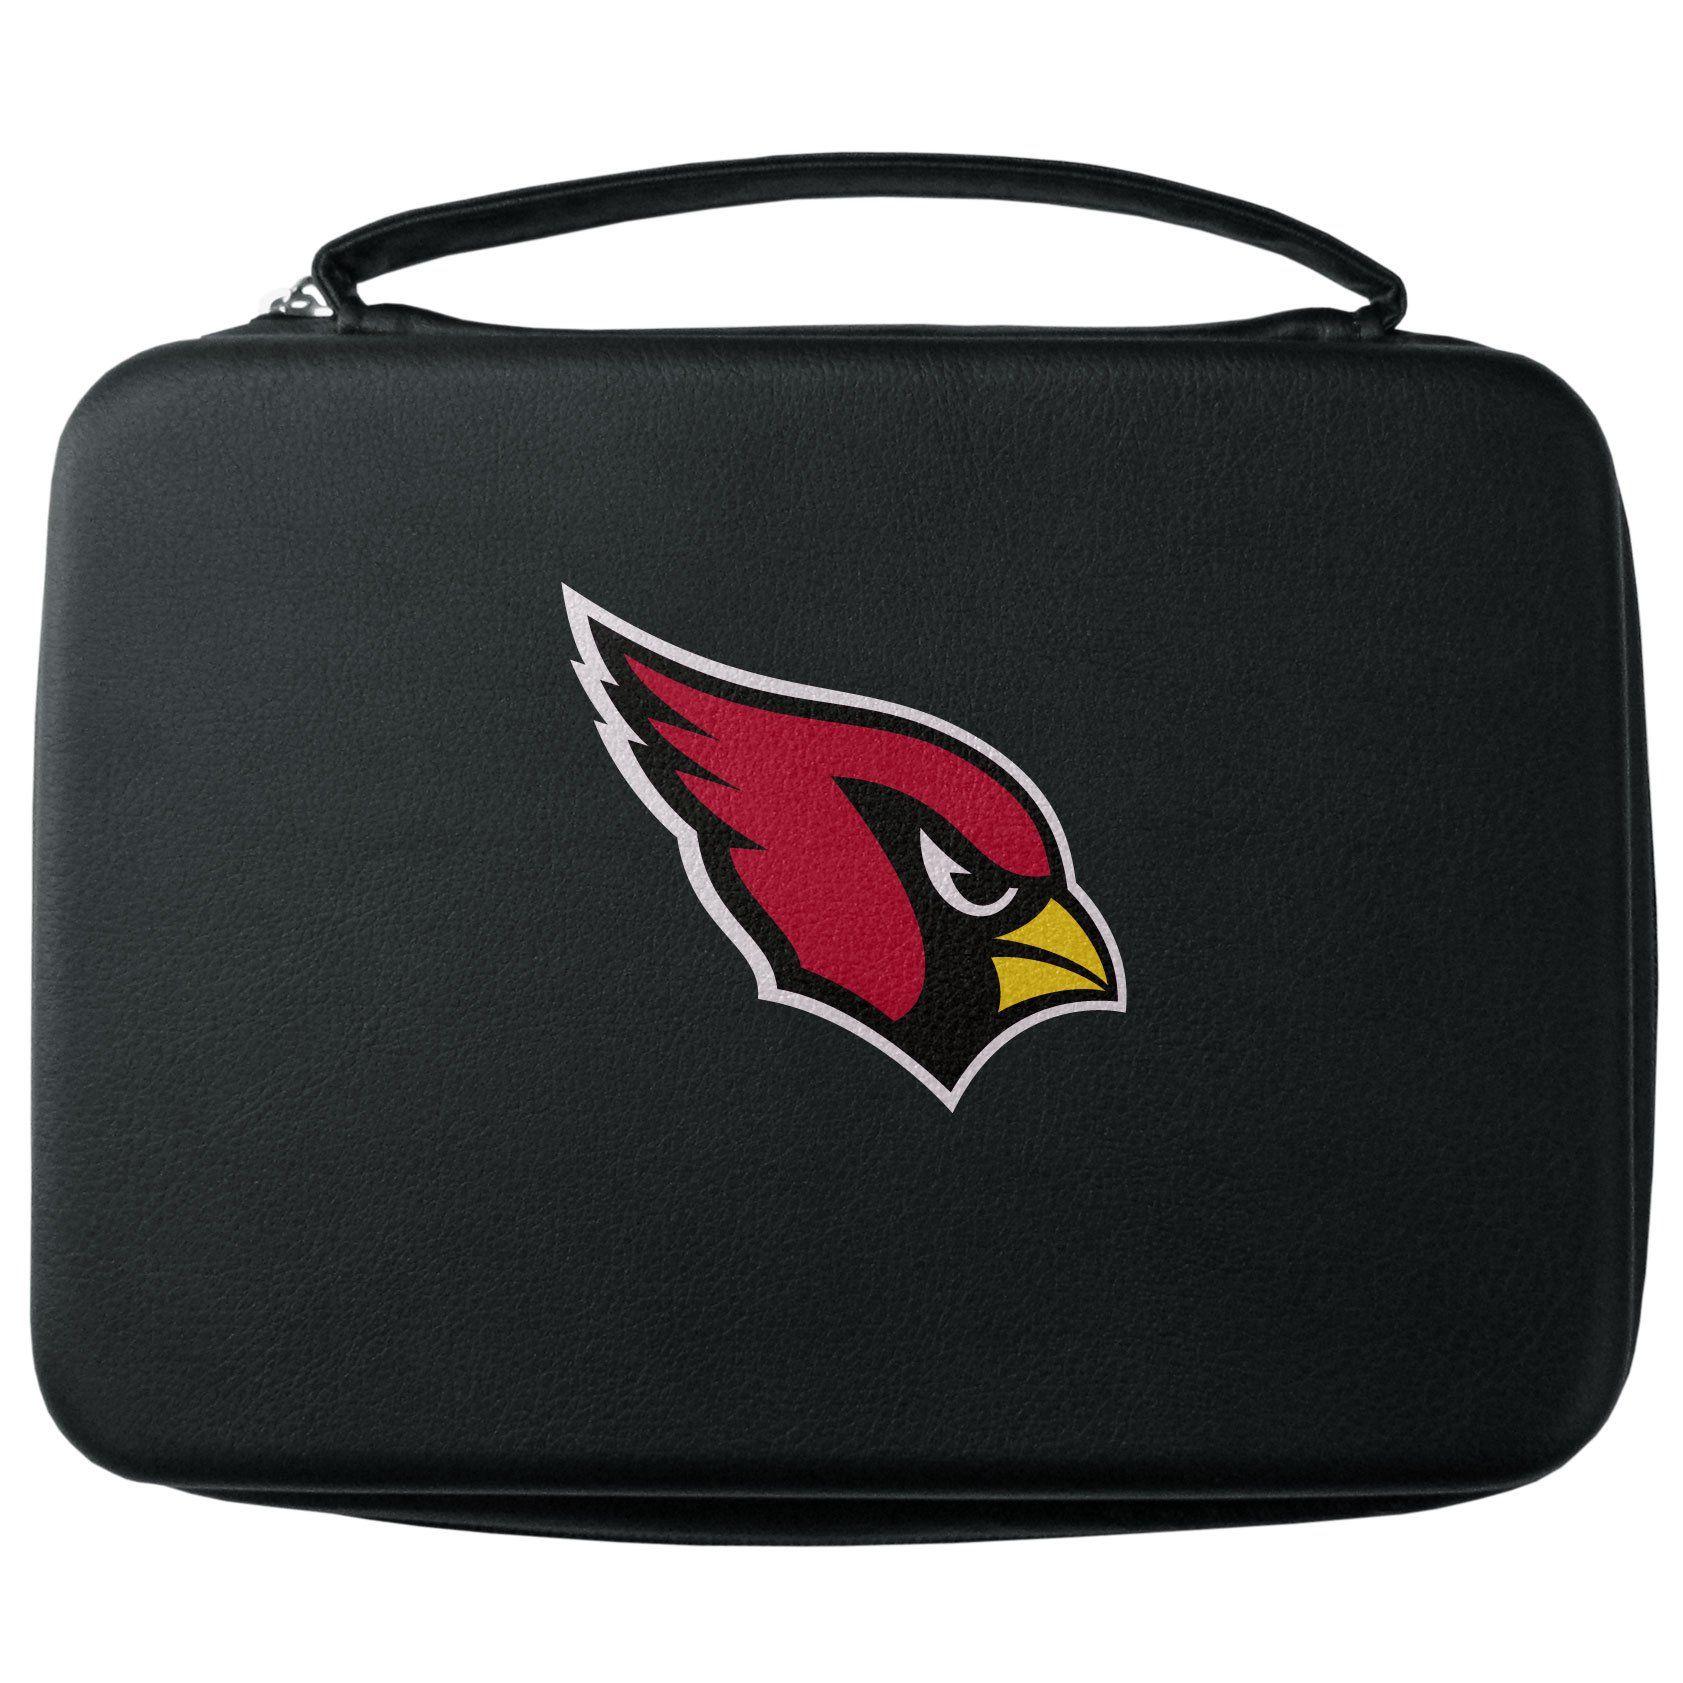 Arizona Cardinals GoPro Carrying Case